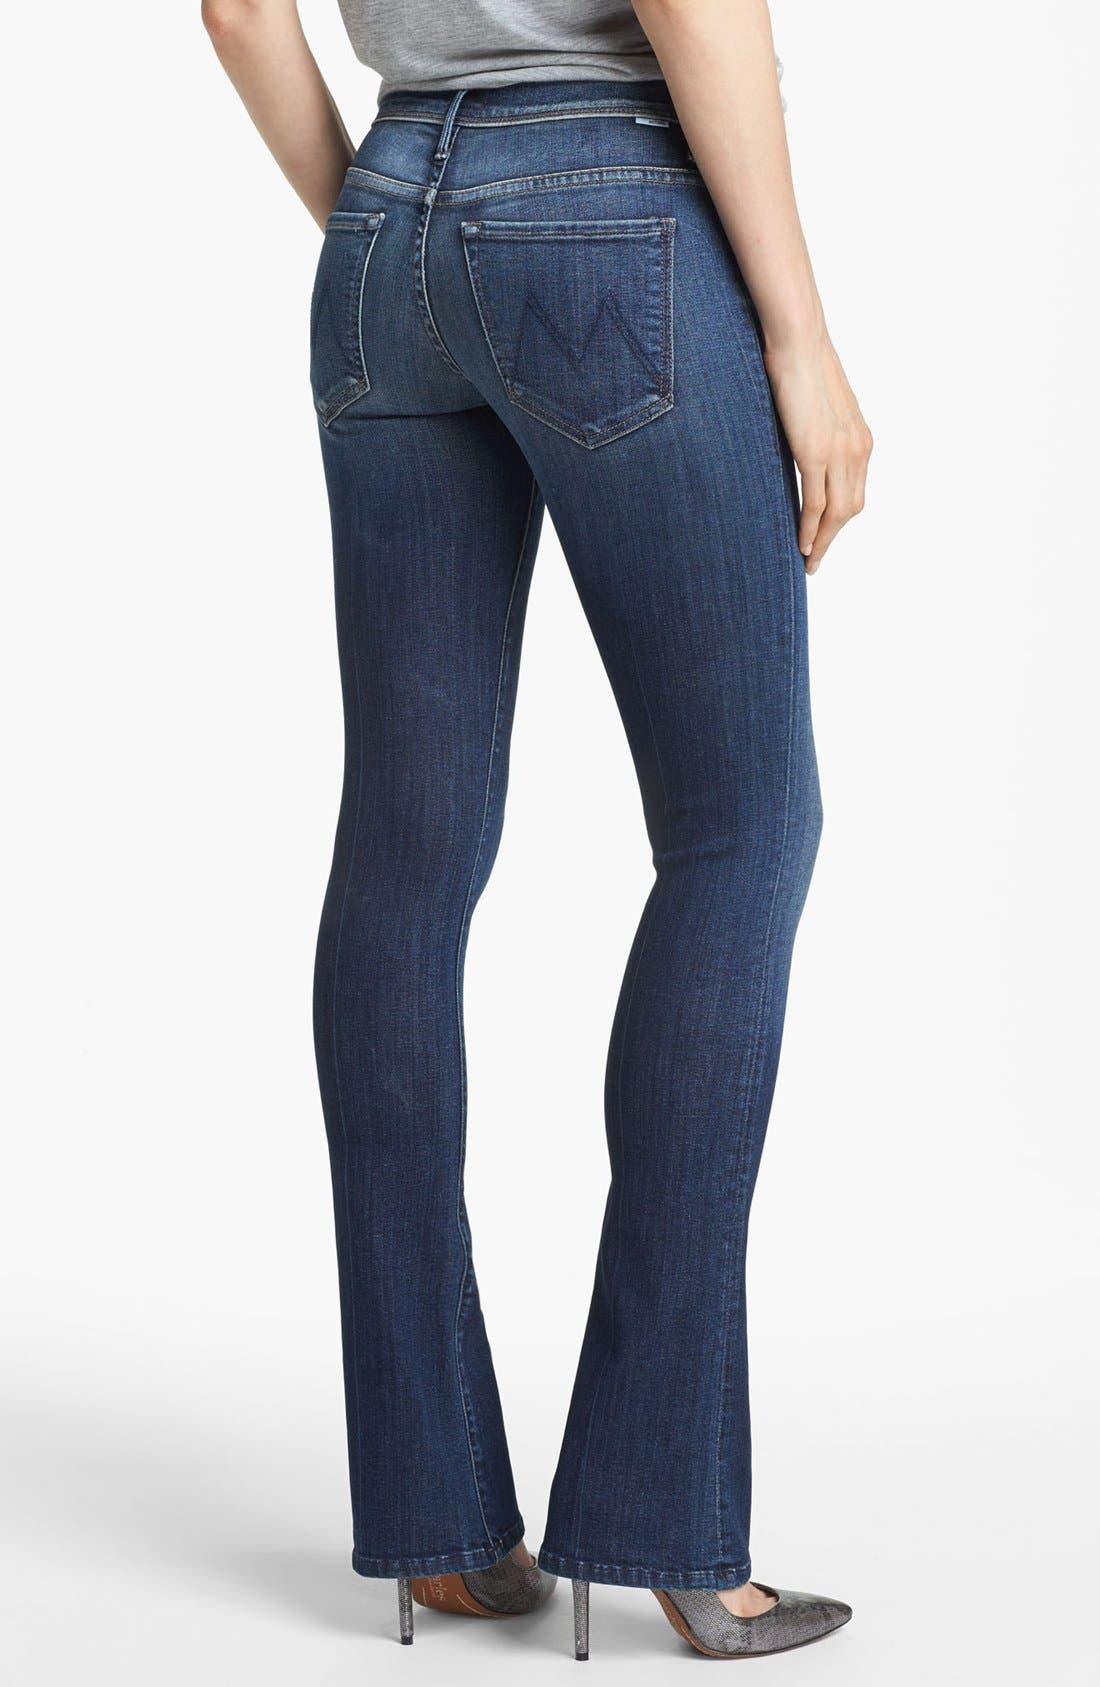 'The Daydreamer' Skinny Flare Leg Jeans,                             Alternate thumbnail 2, color,                             410